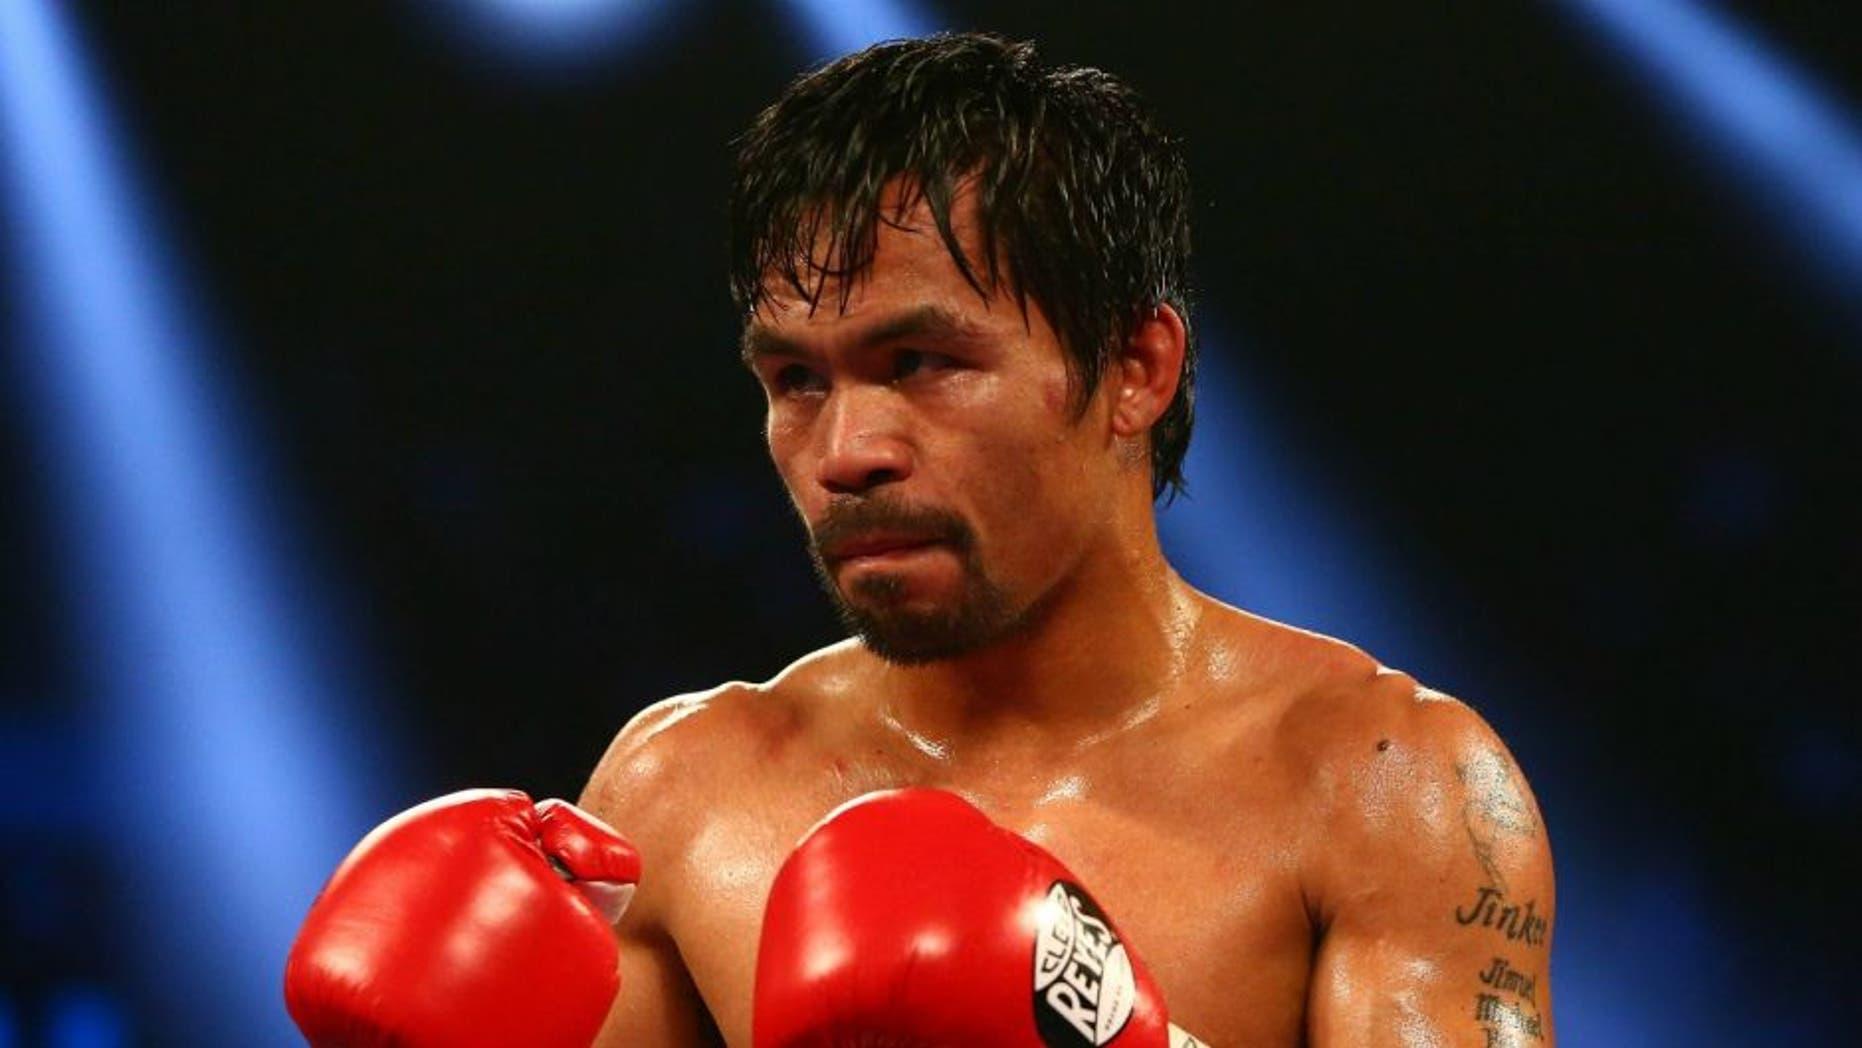 April 9, 2016; Las Vegas, NV, USA; Manny Pacquiao fights against Timothy Bradley at MGM Grand Garden Arena. Mandatory Credit: Mark J. Rebilas-USA TODAY Sports